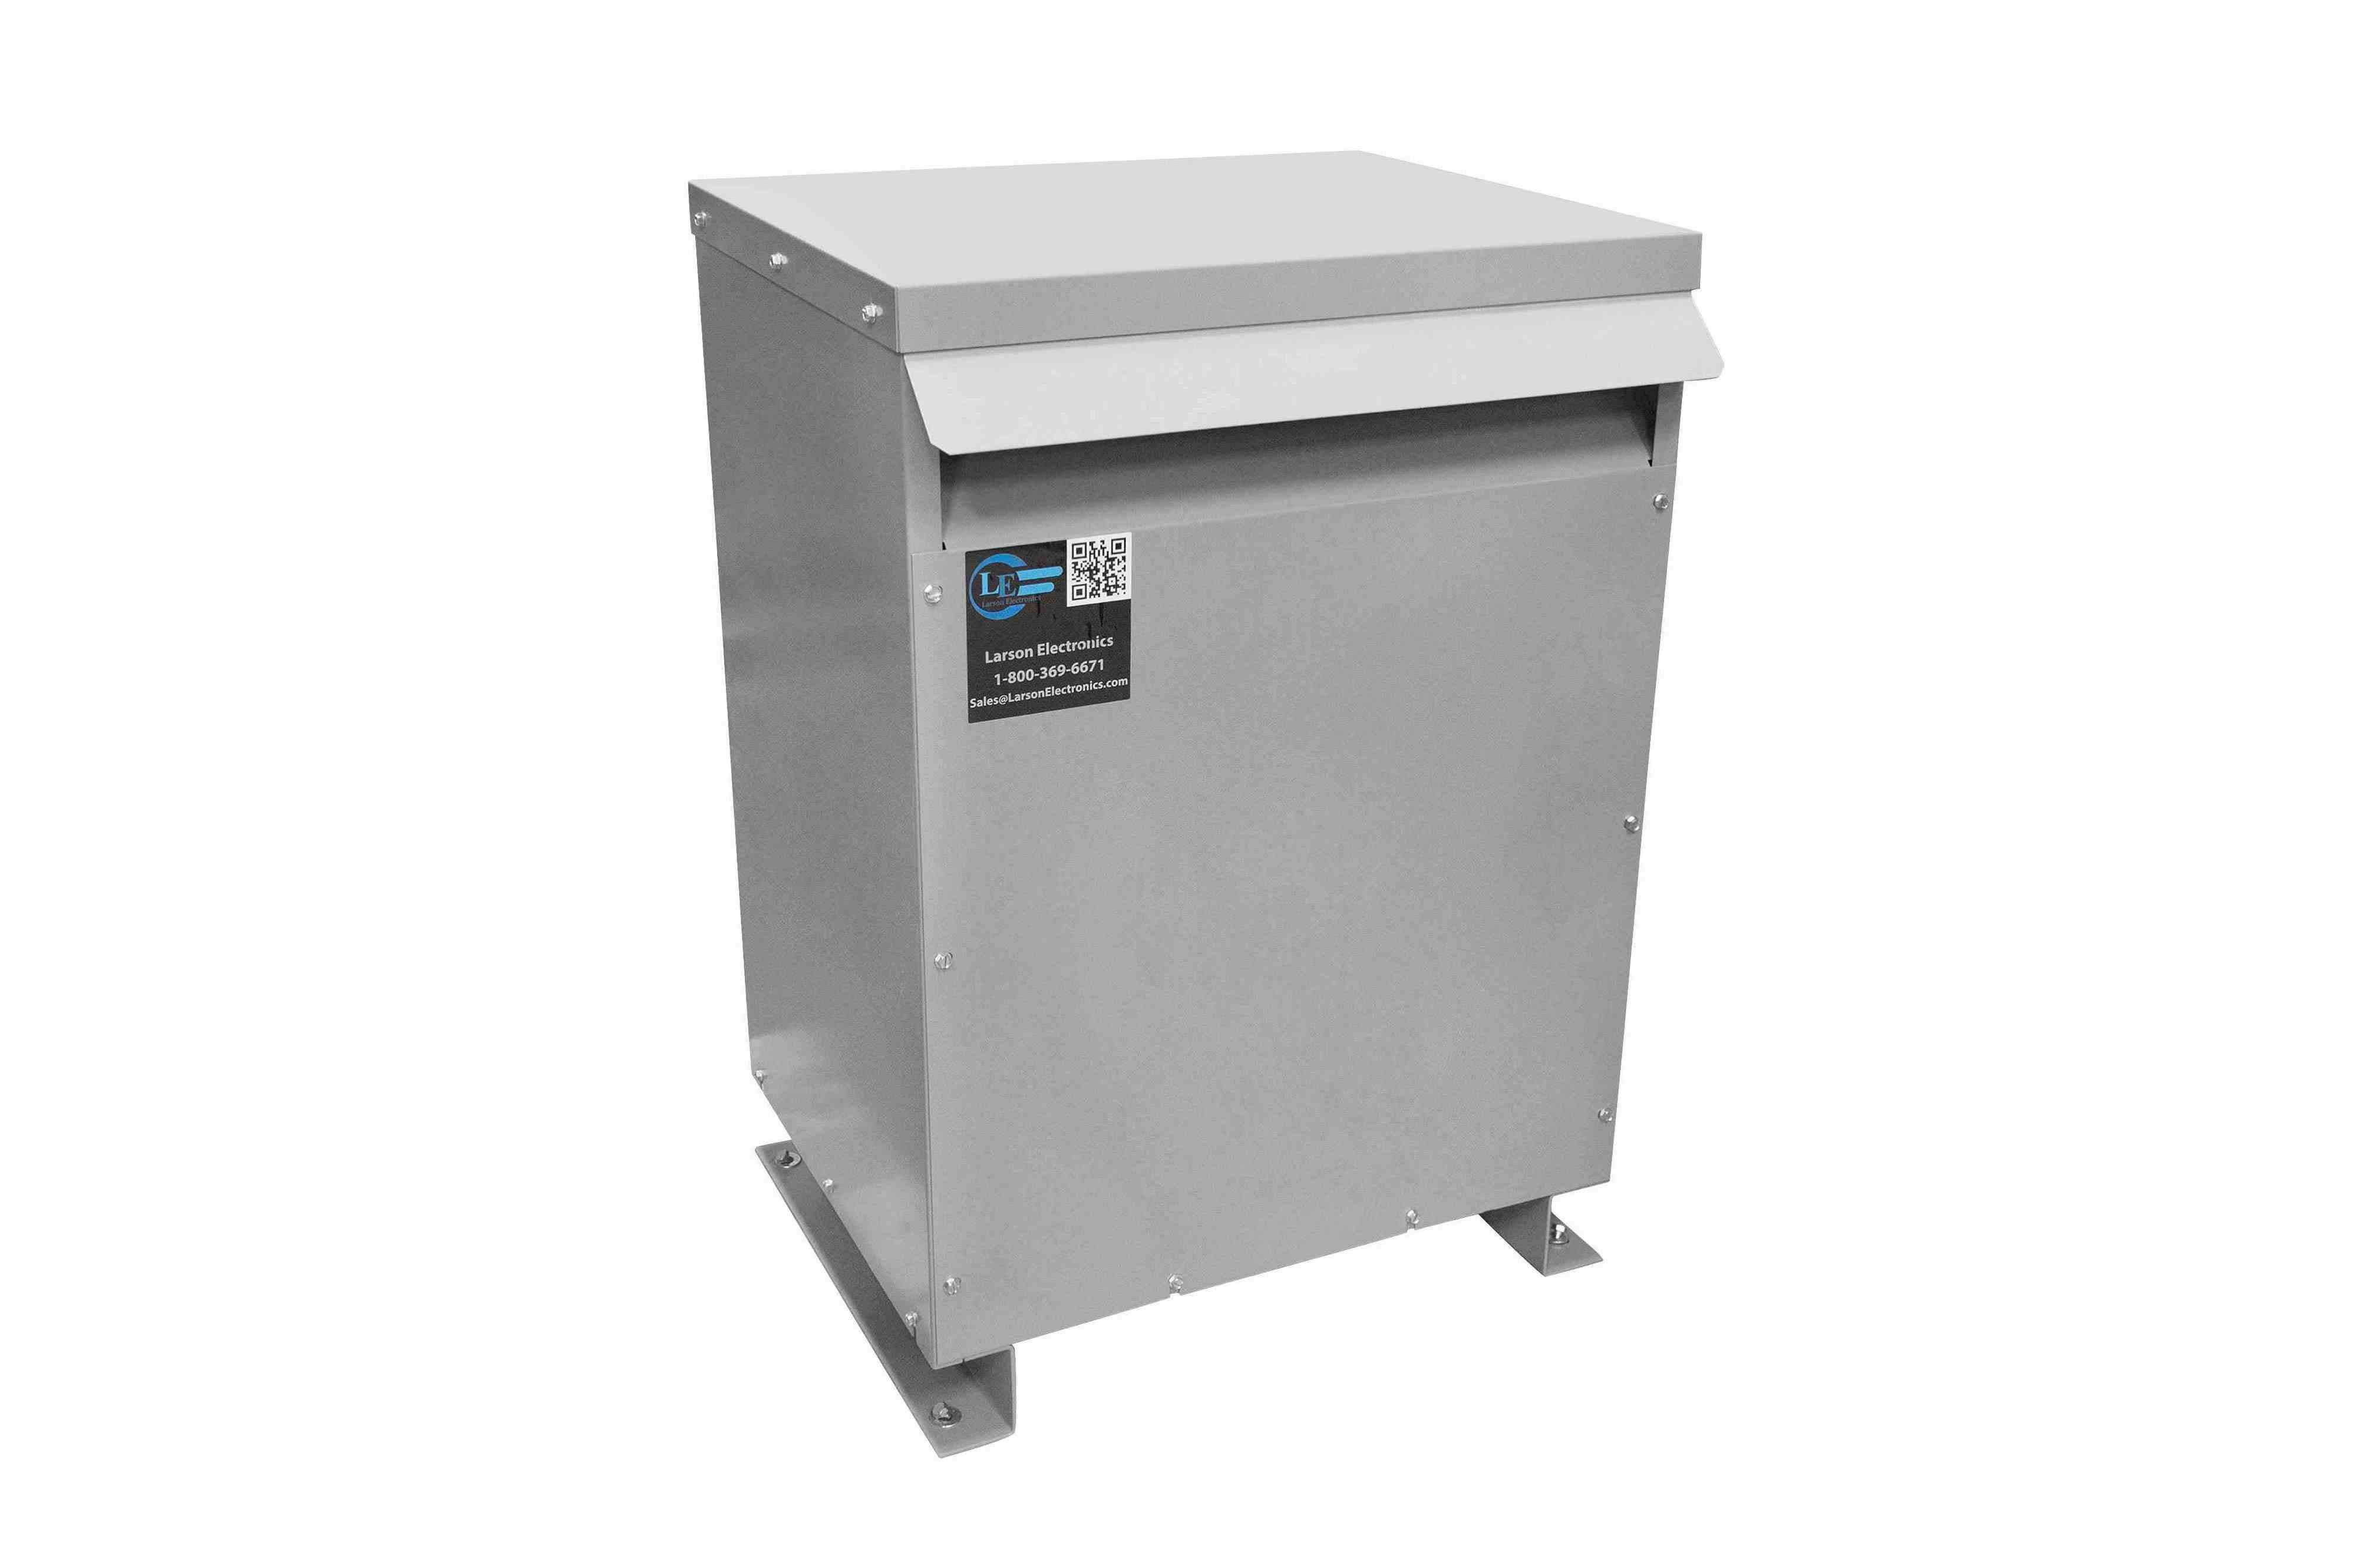 200 kVA 3PH DOE Transformer, 480V Delta Primary, 480Y/277 Wye-N Secondary, N3R, Ventilated, 60 Hz